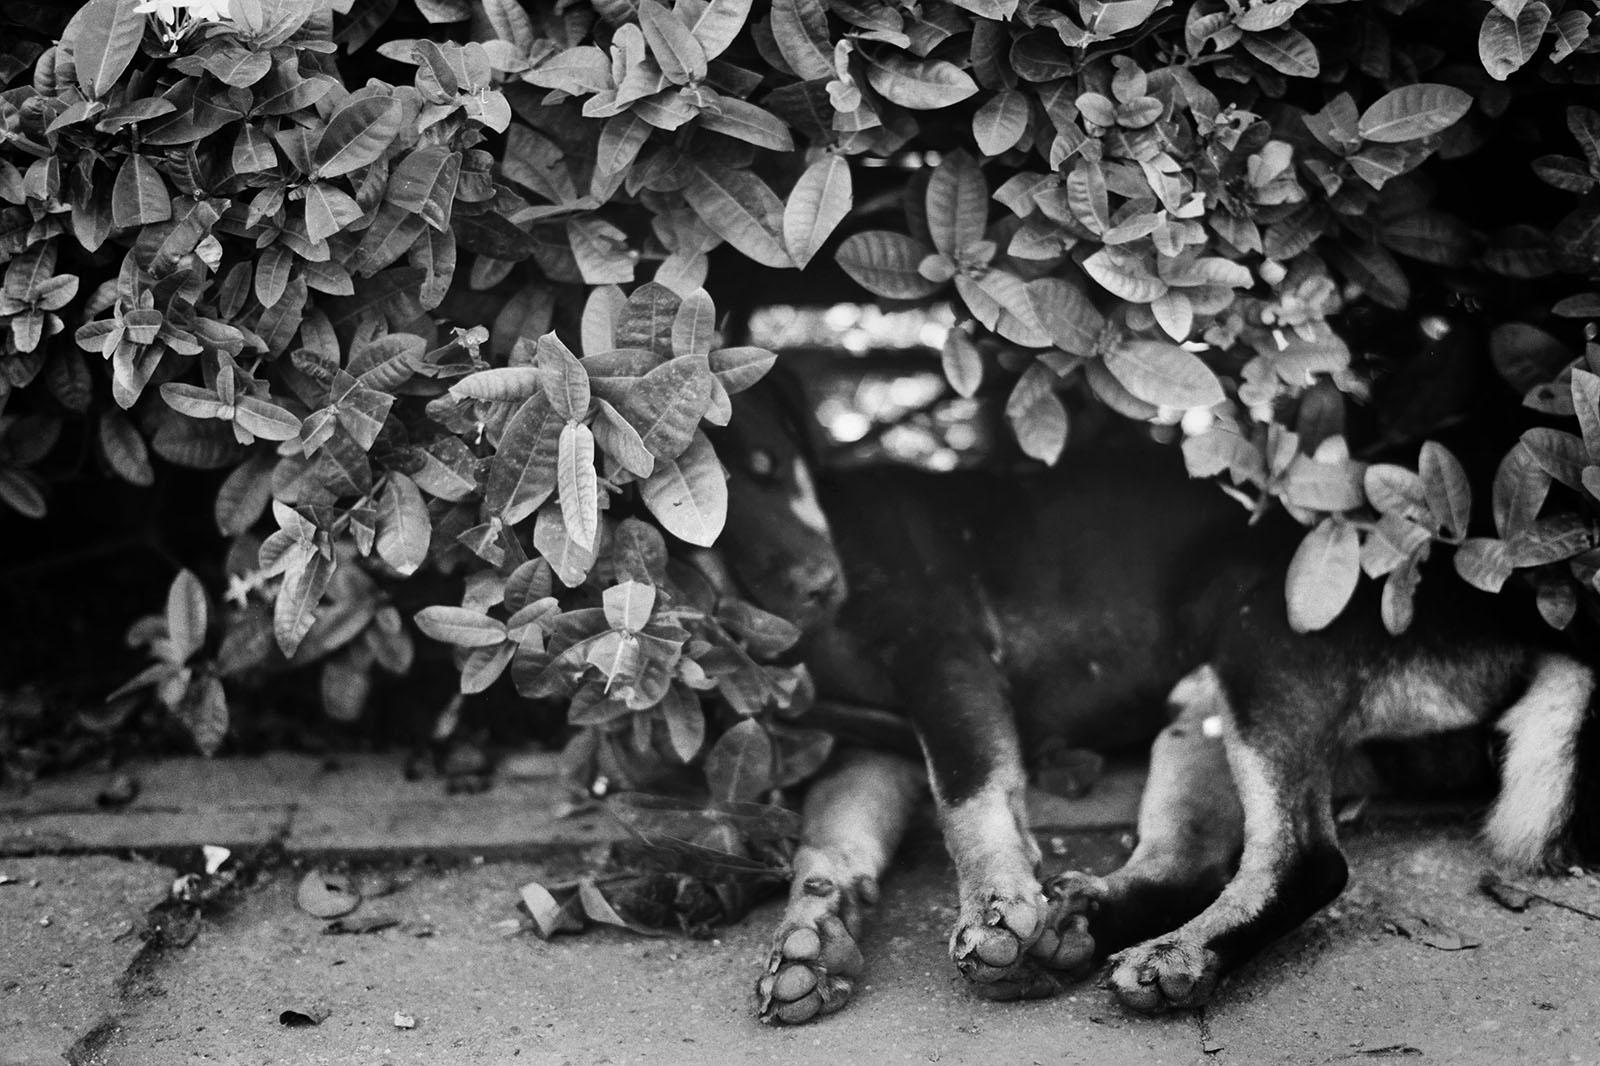 Soi dog sleeping in the bushes | Thailand Travel Photos